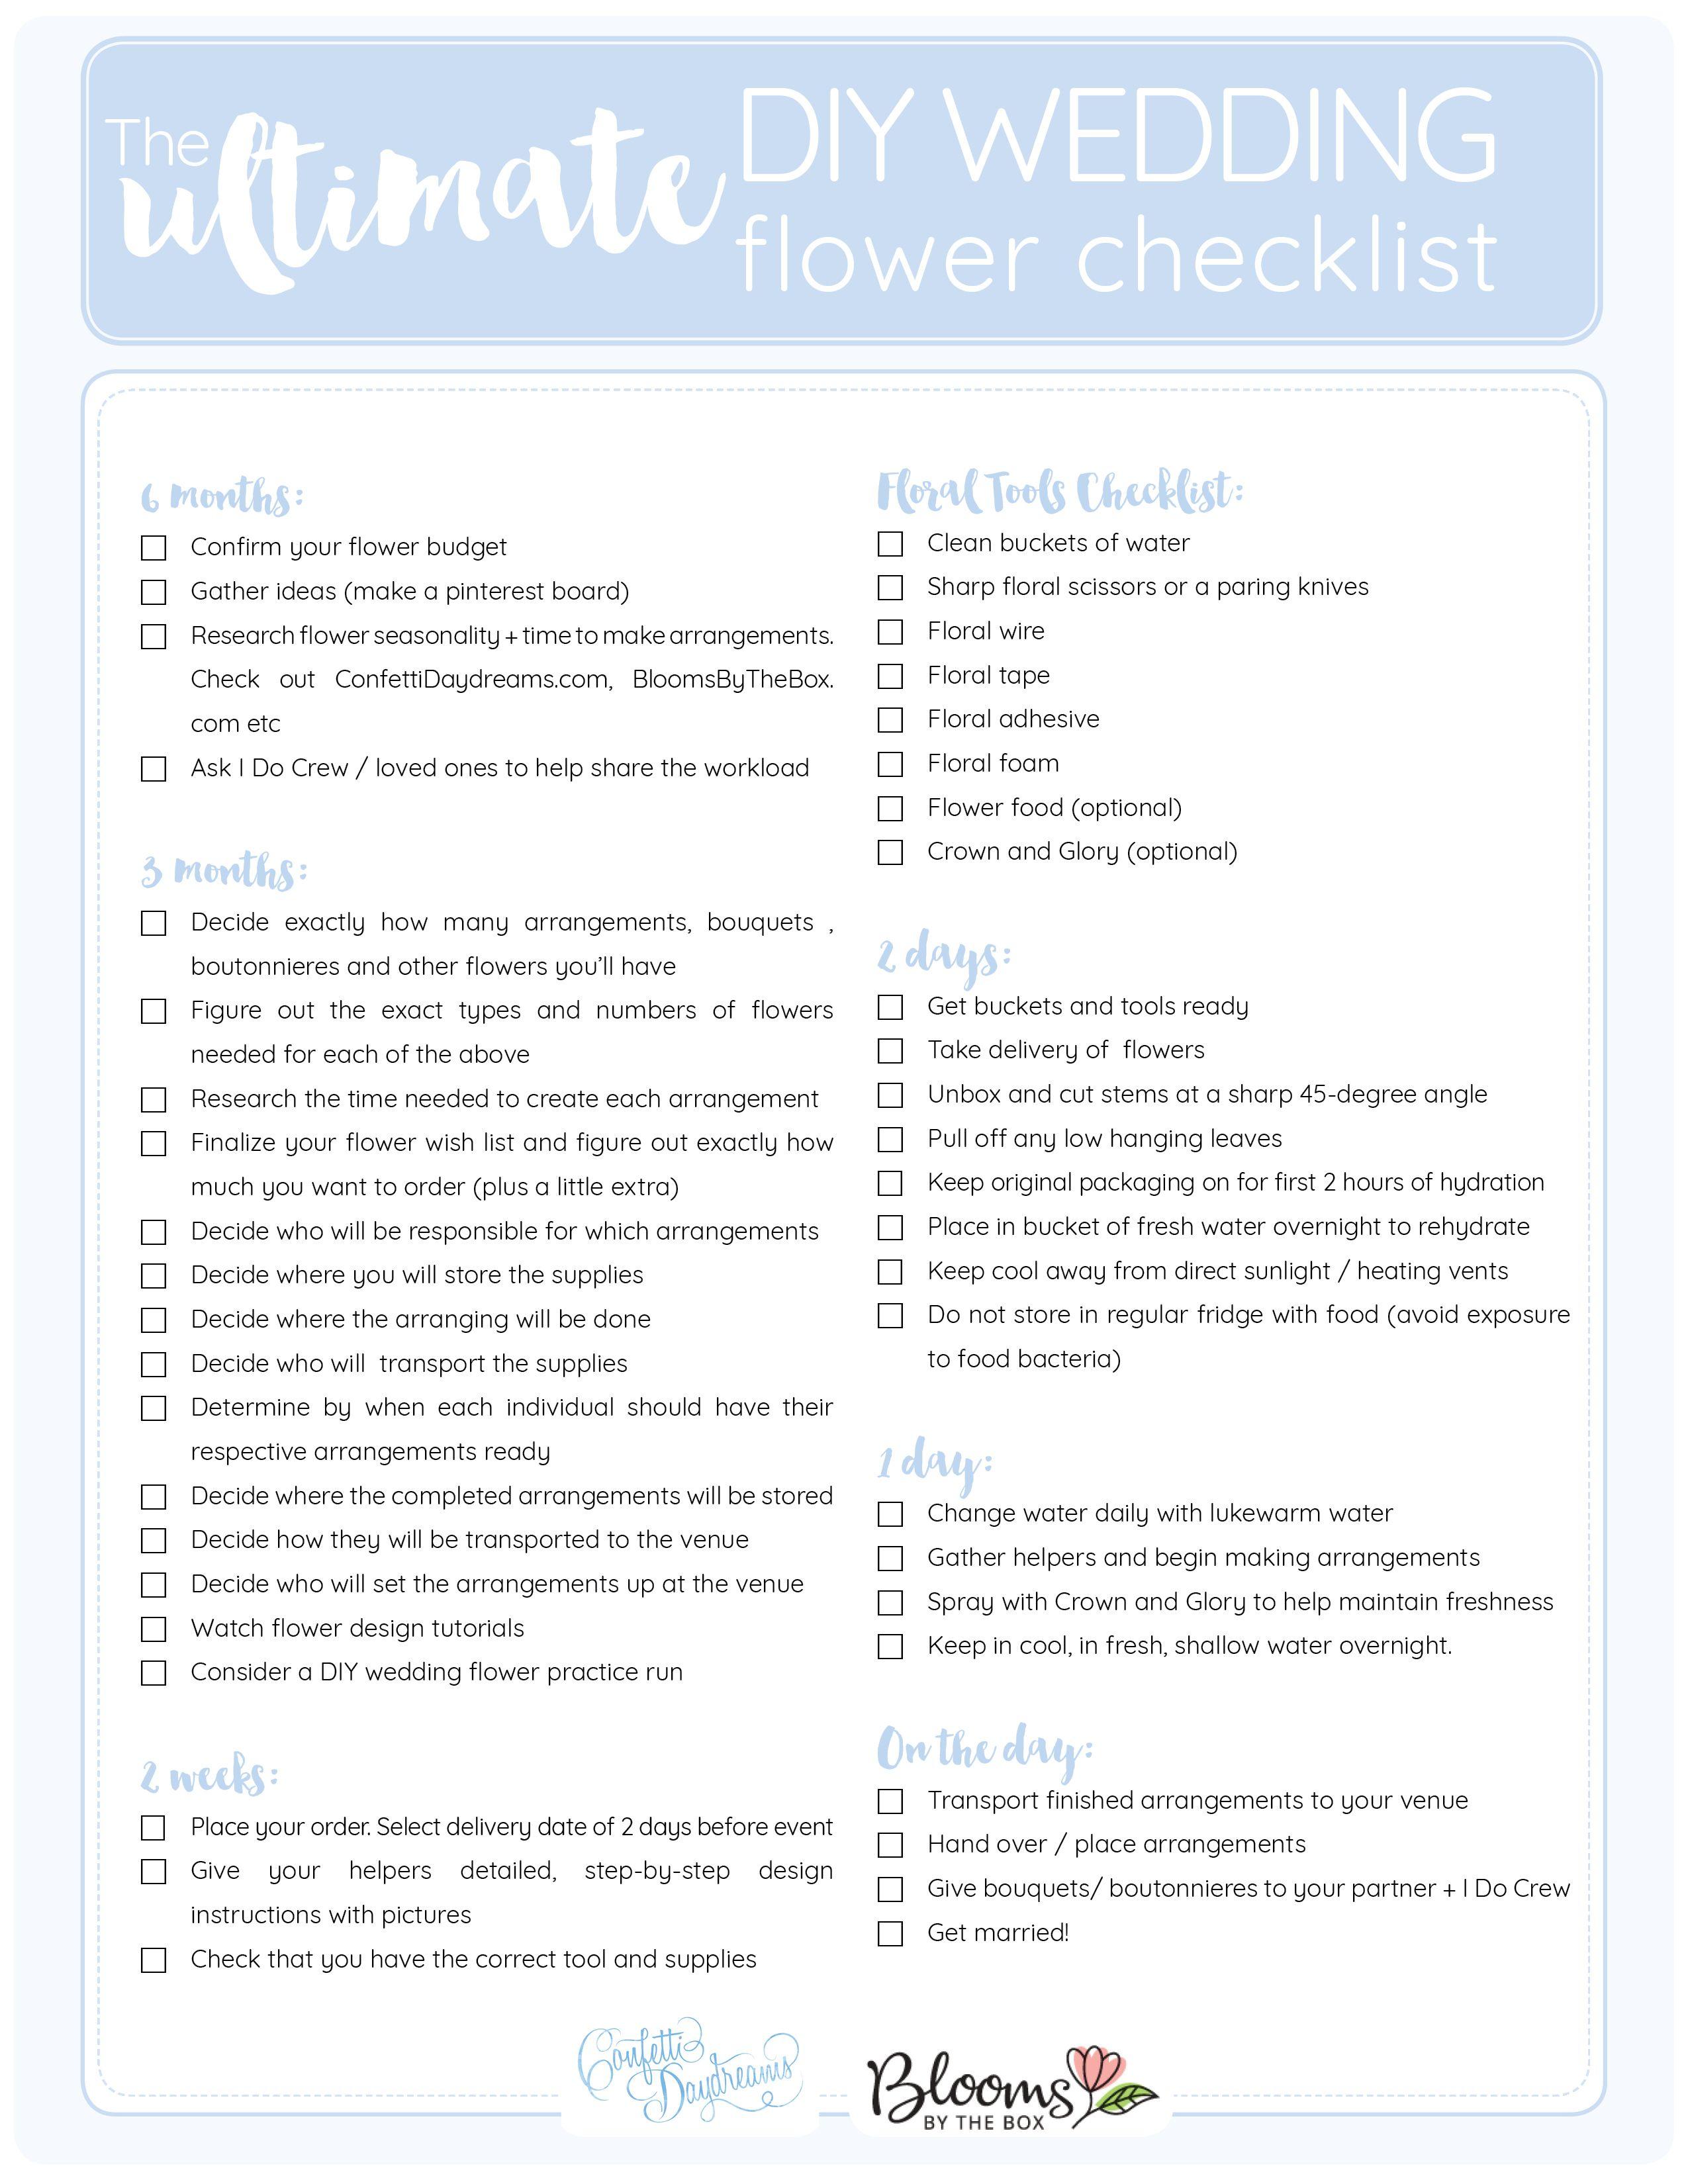 The Ultimate Diy Wedding Flower Checklist Printable Wedding Flower Guide Wedding Checklist Diy Wedding